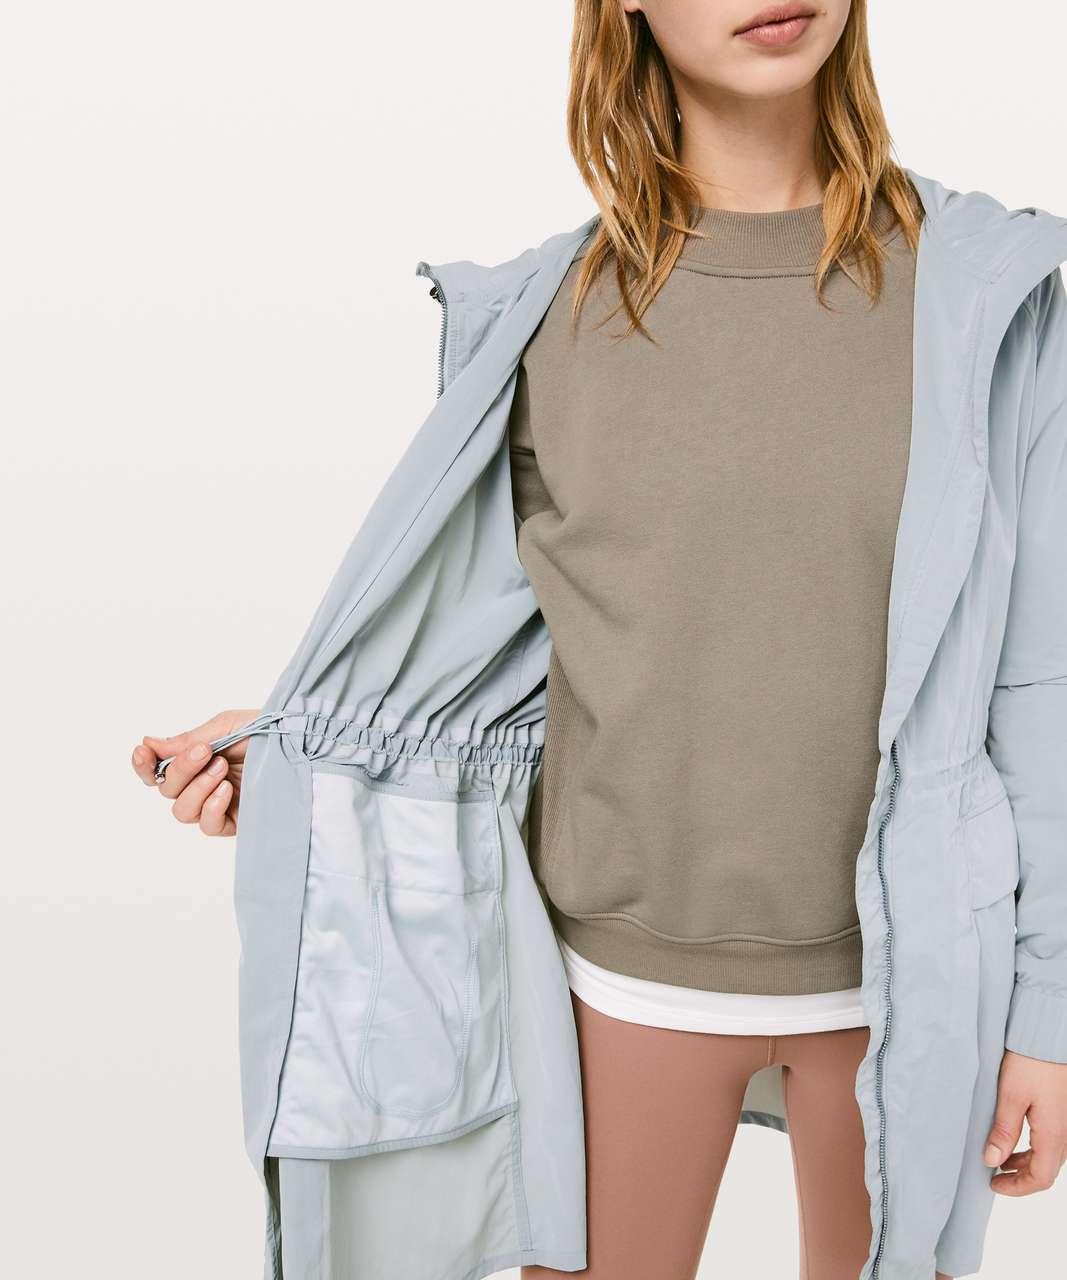 Lululemon Pack & Glyde Jacket - Silver Drop